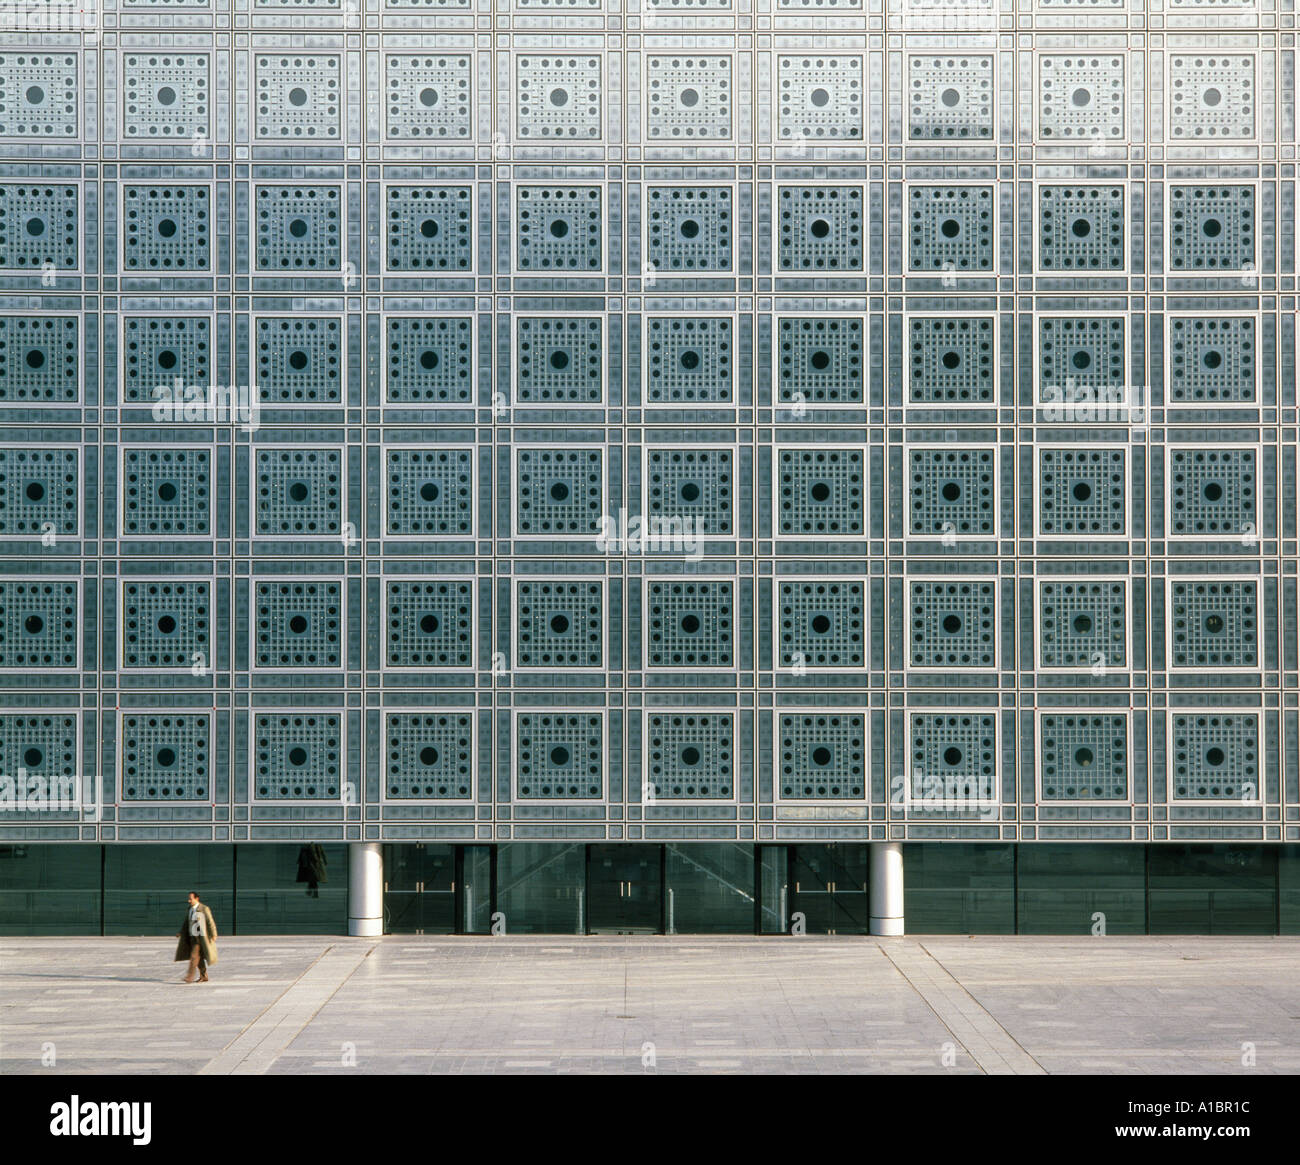 Institut du Monde Arabe, South facade, Paris, 1987. Photosensitive window screens. Architect: Jean Nouvel Stock Photo